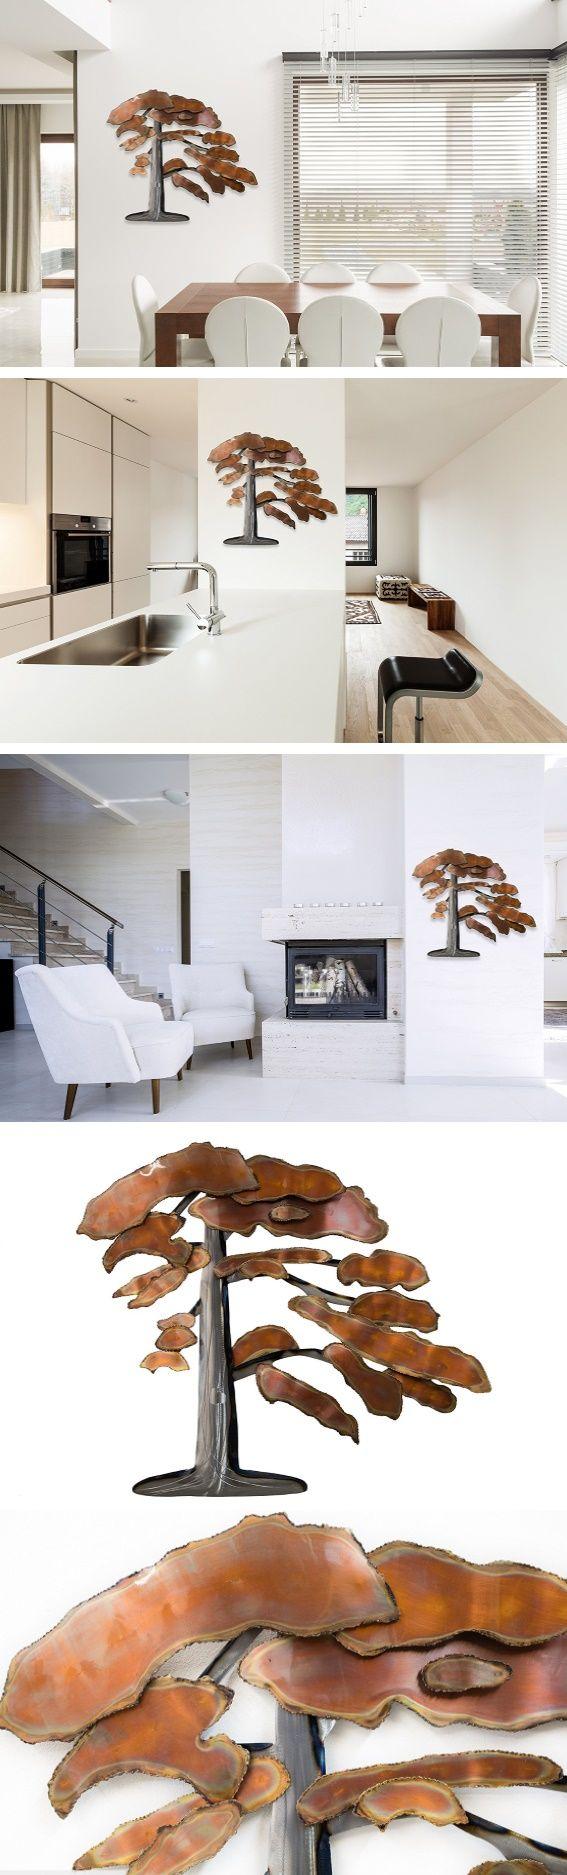 25 best ideas about wanddeko metall on pinterest wanddeko aus metall vintage metall and. Black Bedroom Furniture Sets. Home Design Ideas